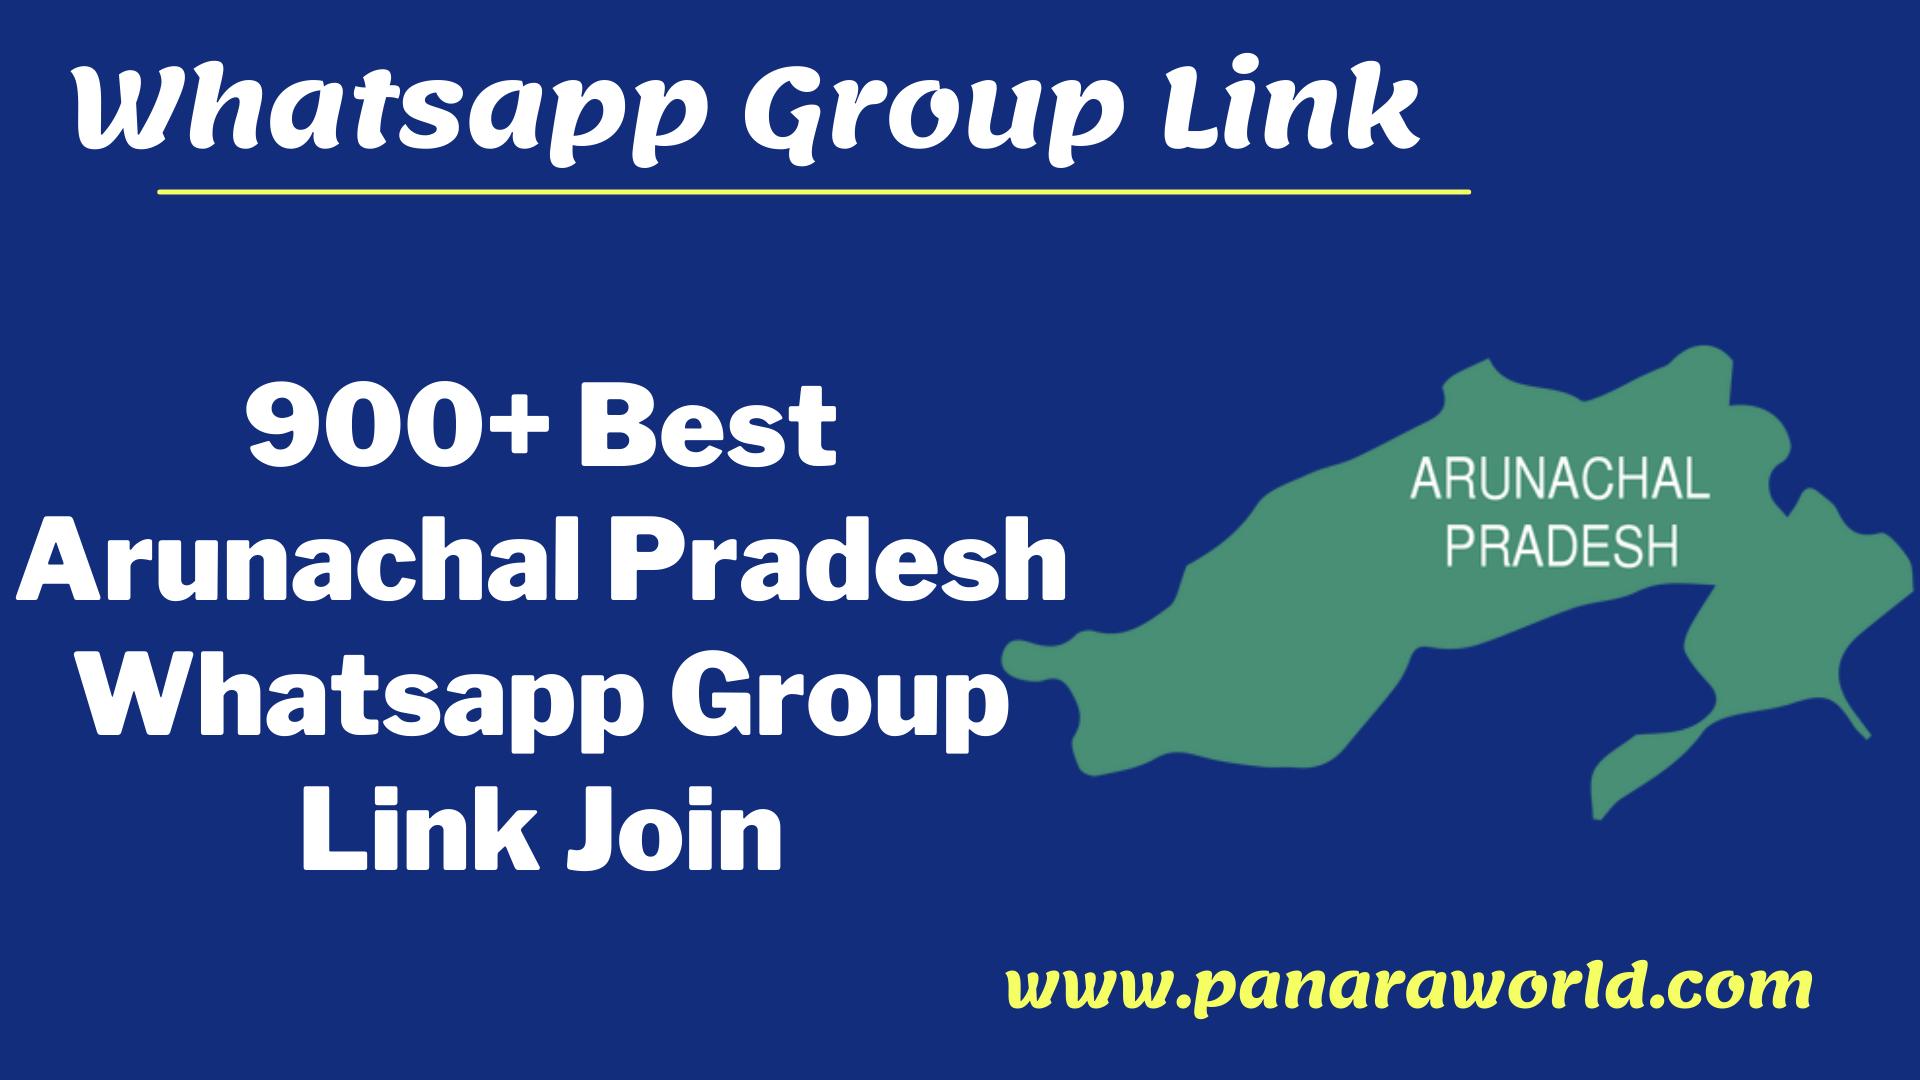 Arunachal Pradesh Whatsapp Group link